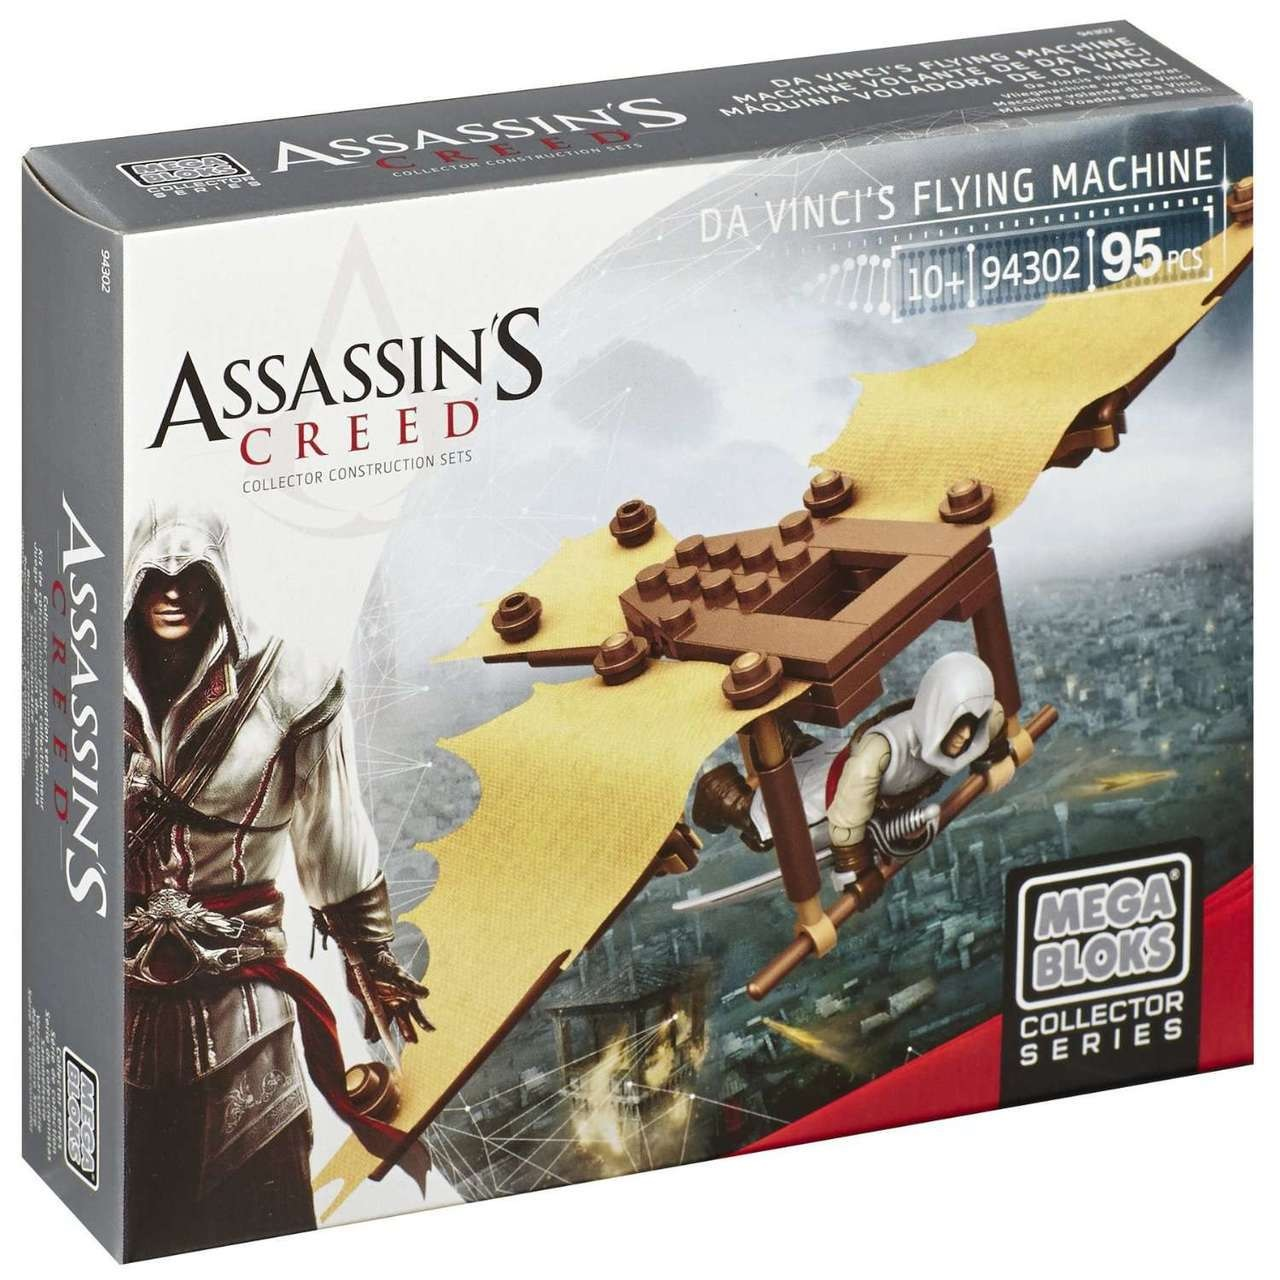 ساختنی مگا بلاکس مدل Assassins Creed کد 94302